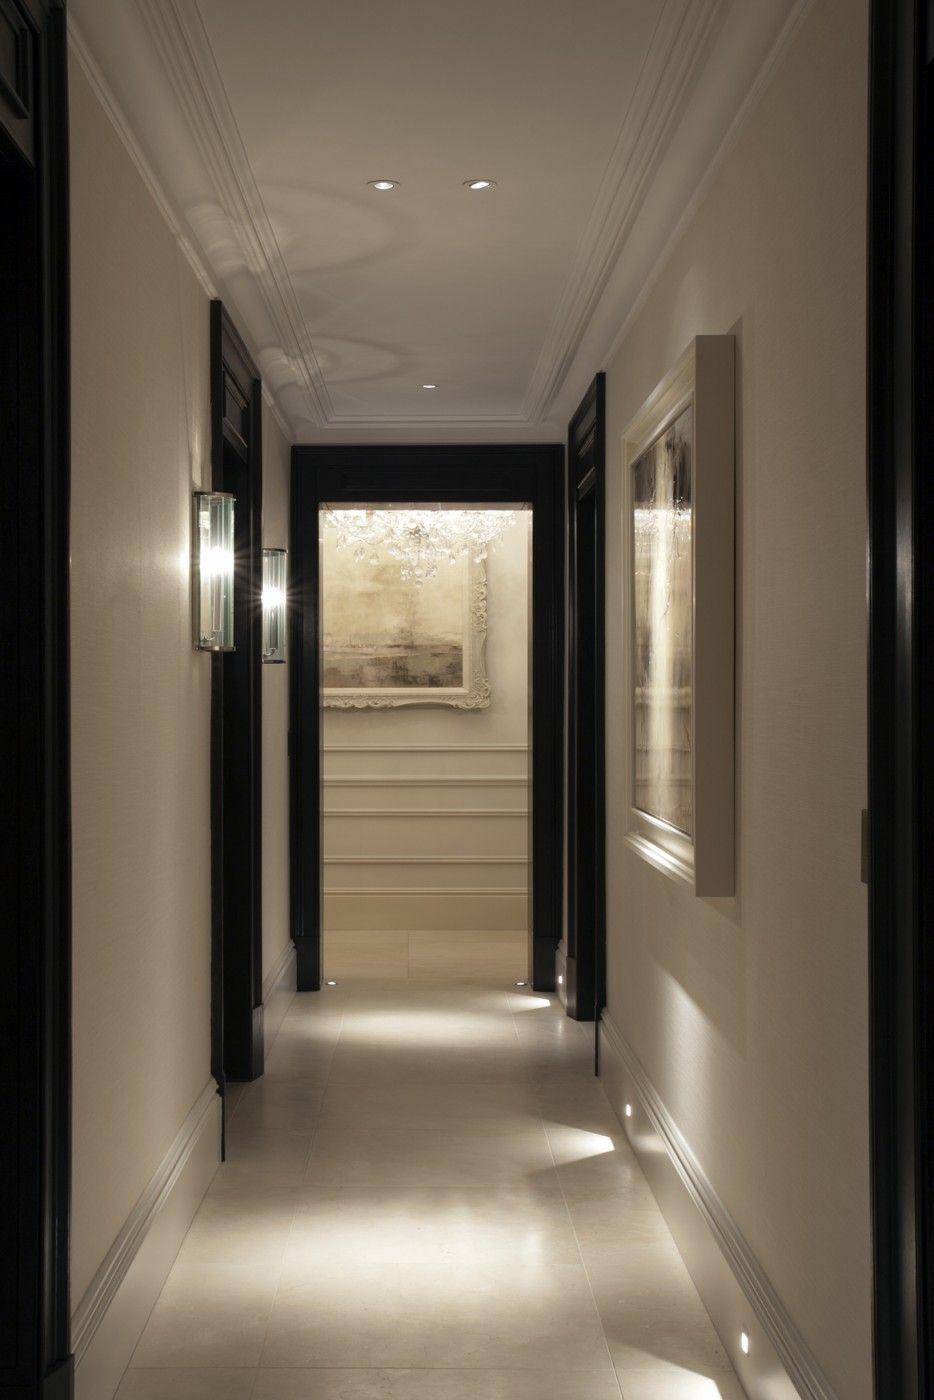 Entry hallway lighting  Ennismore Gardens  Taylor Howes  Town  Pinterest  Hall Hall